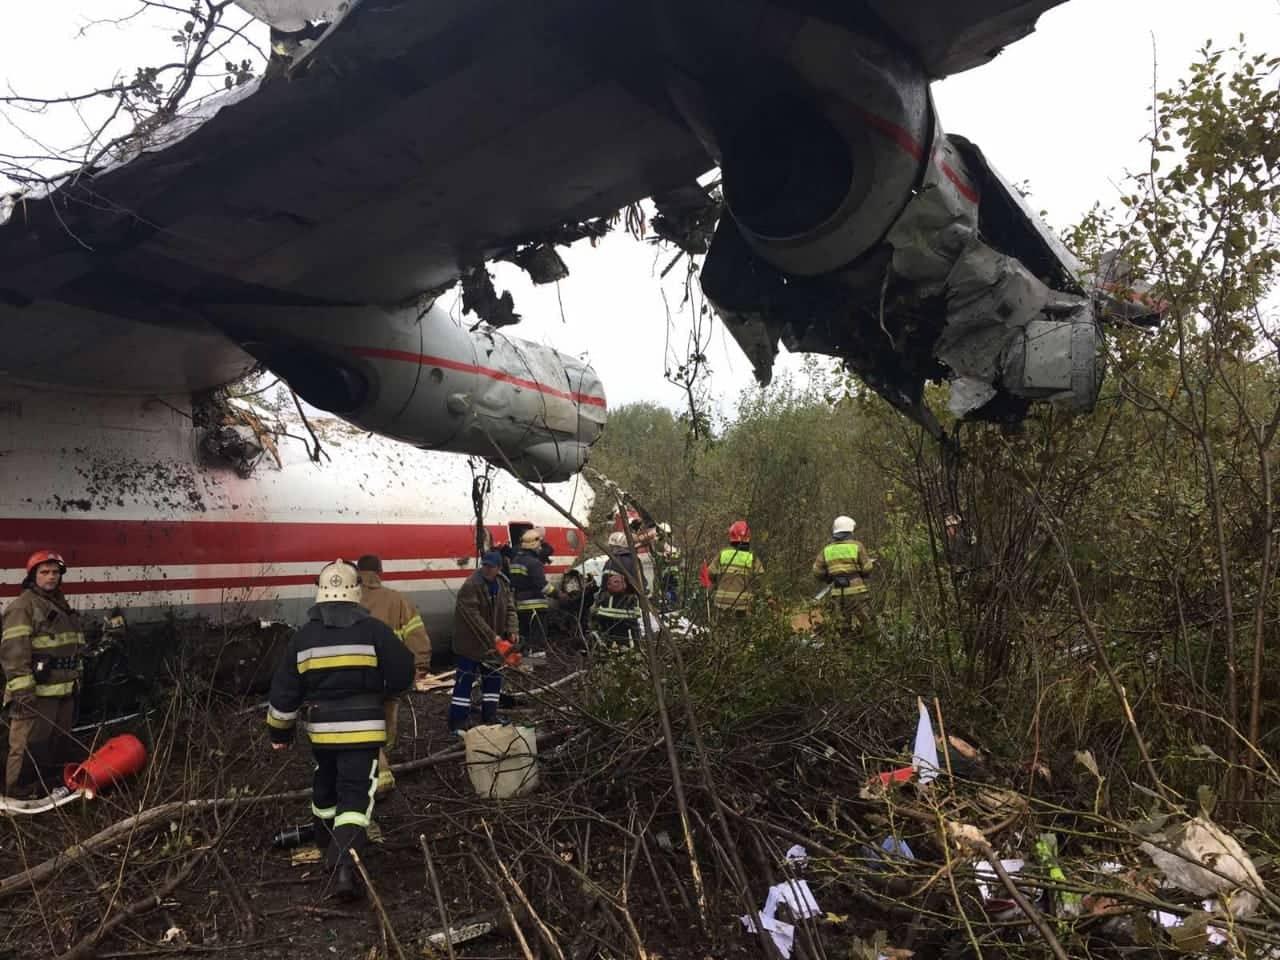 Авиакатастрофа на Львовщине: спасатели сообщают о 5 погибших. ФОТО